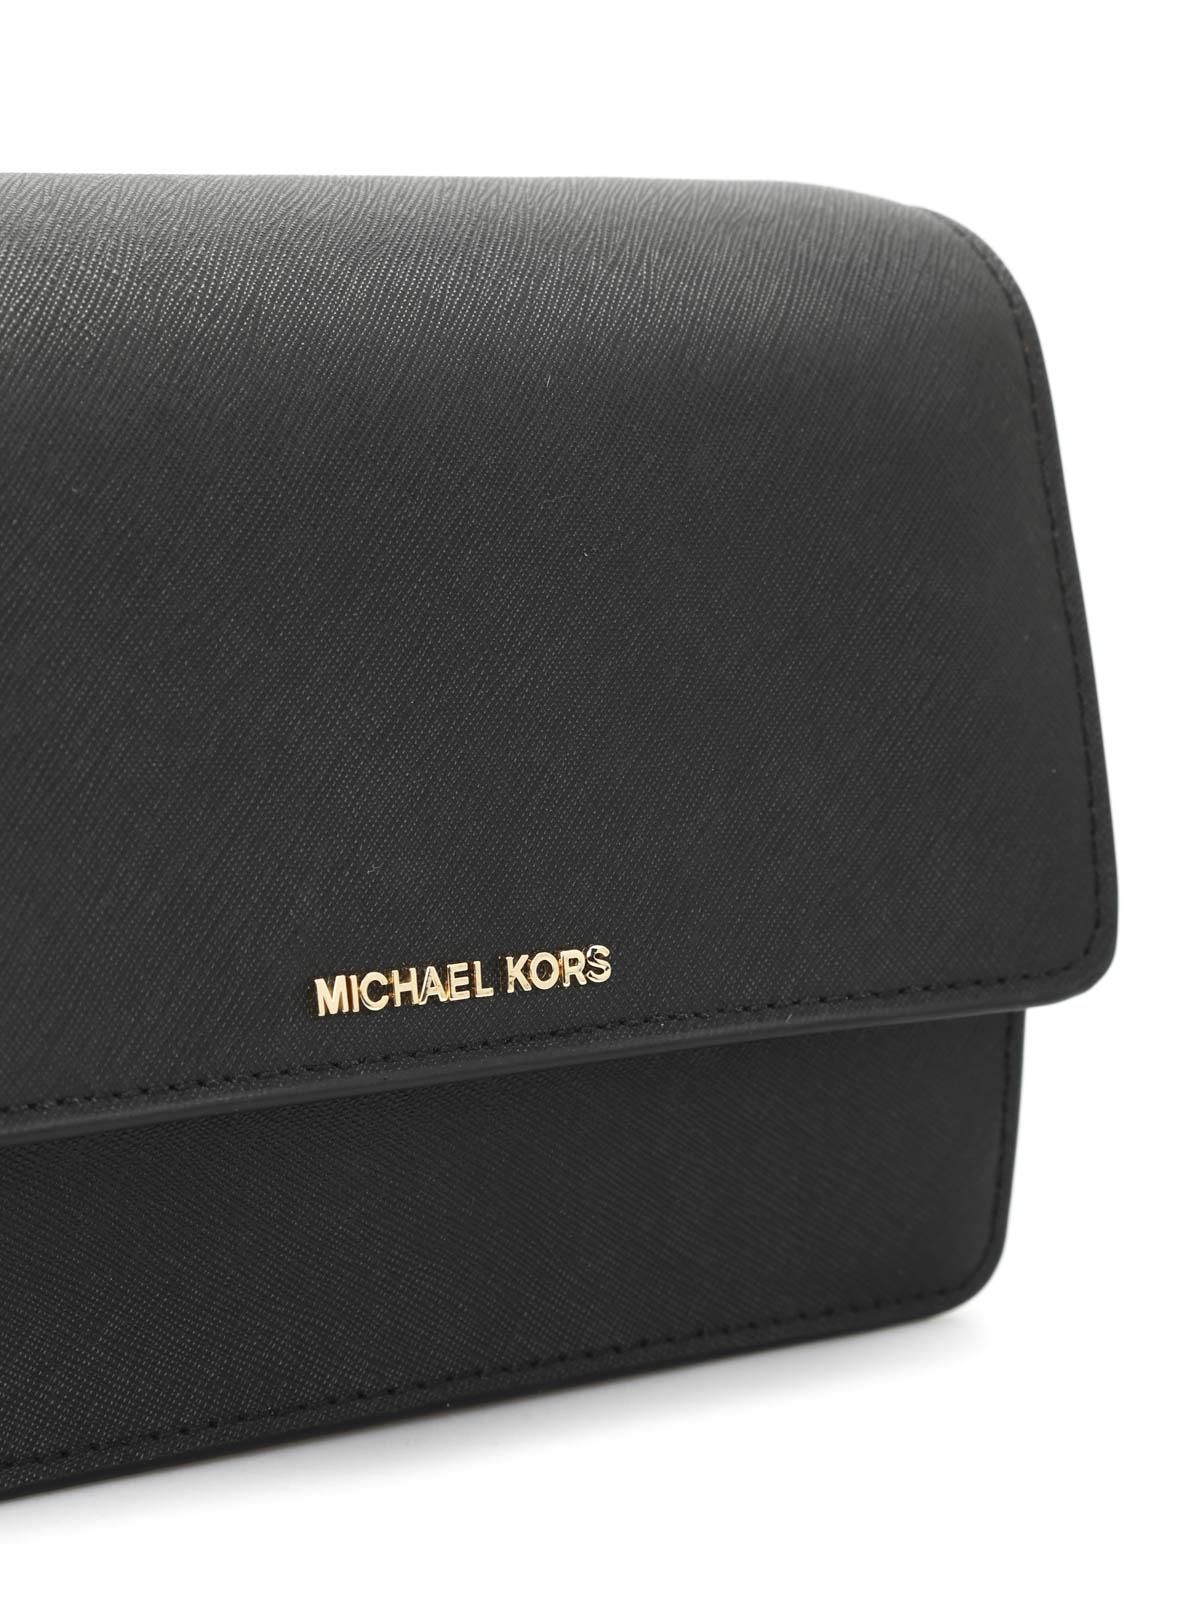 77c05f03be9364 iKRIX MICHAEL KORS: cross body bags - Daniela small leather crossbody. Daniela  small leather crossbody shop online: MICHAEL KORS